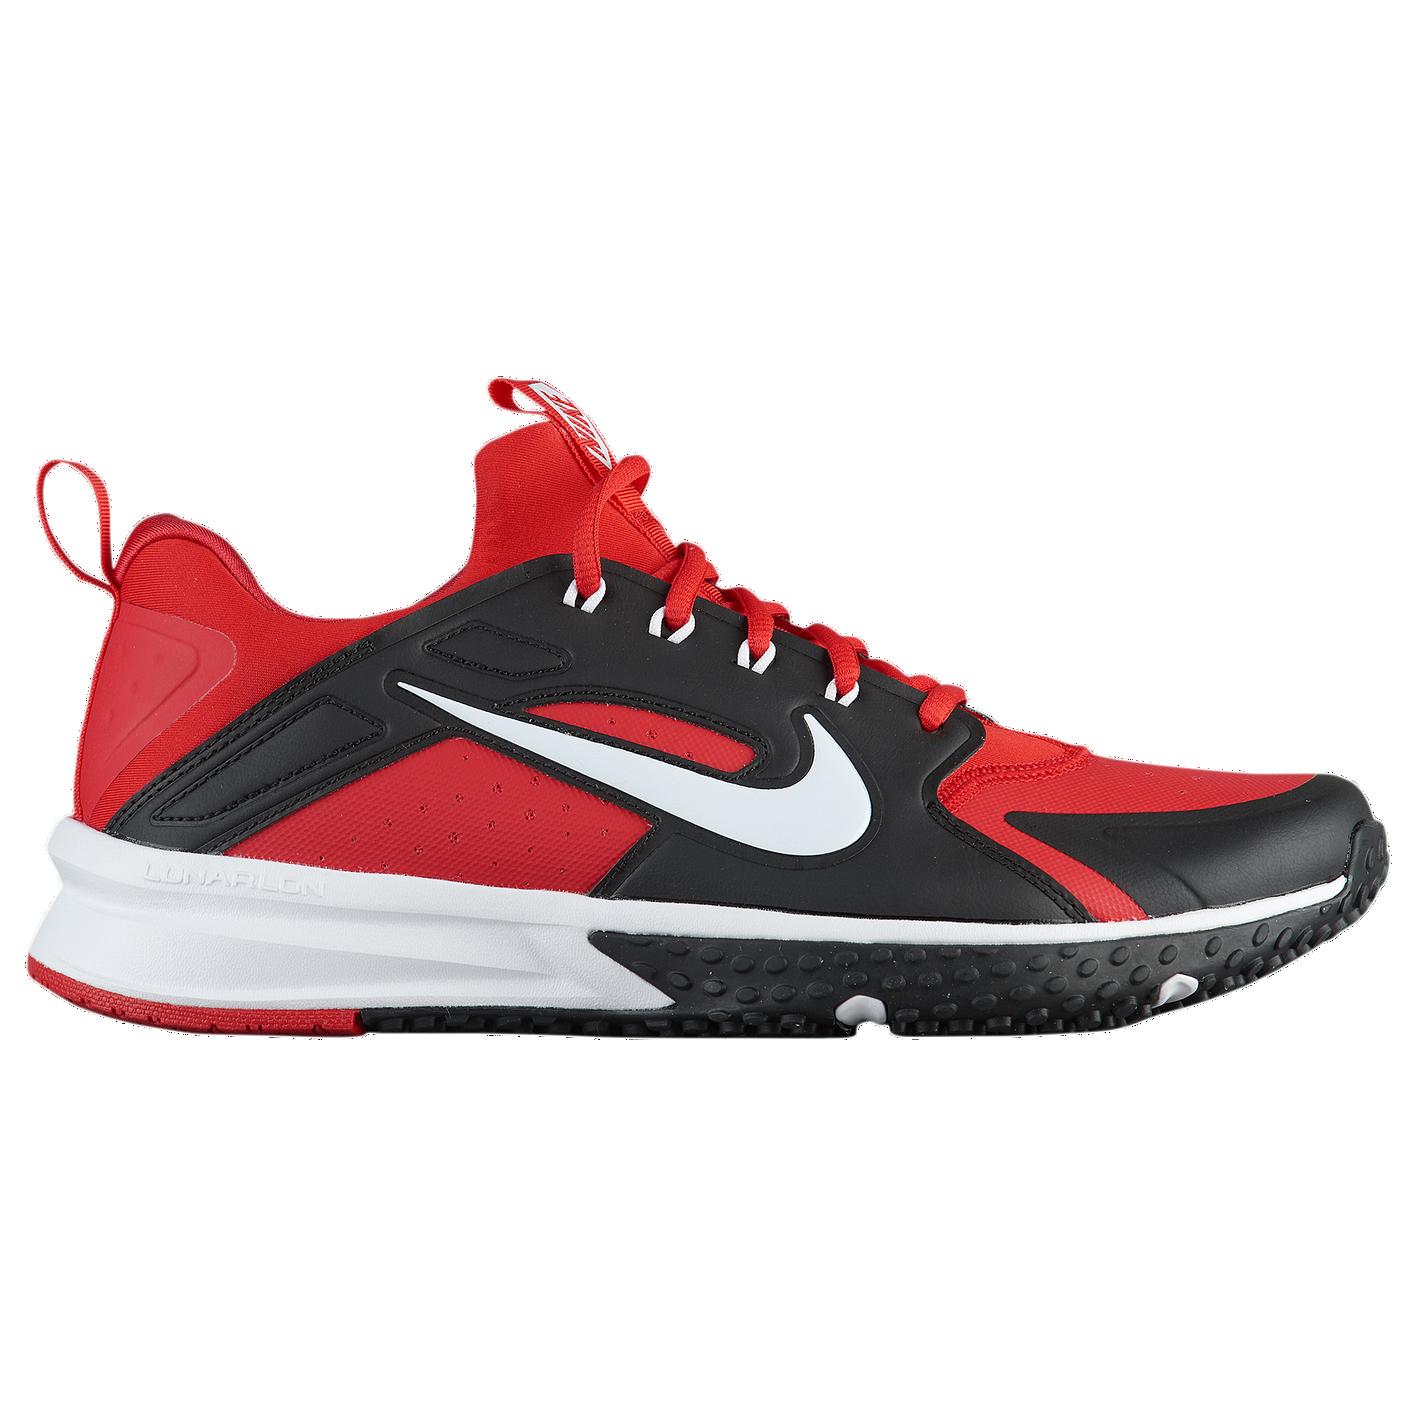 Nike Alpha Huarache Turf - Men s - Baseball - Shoes - University Red ... 7fcd43811